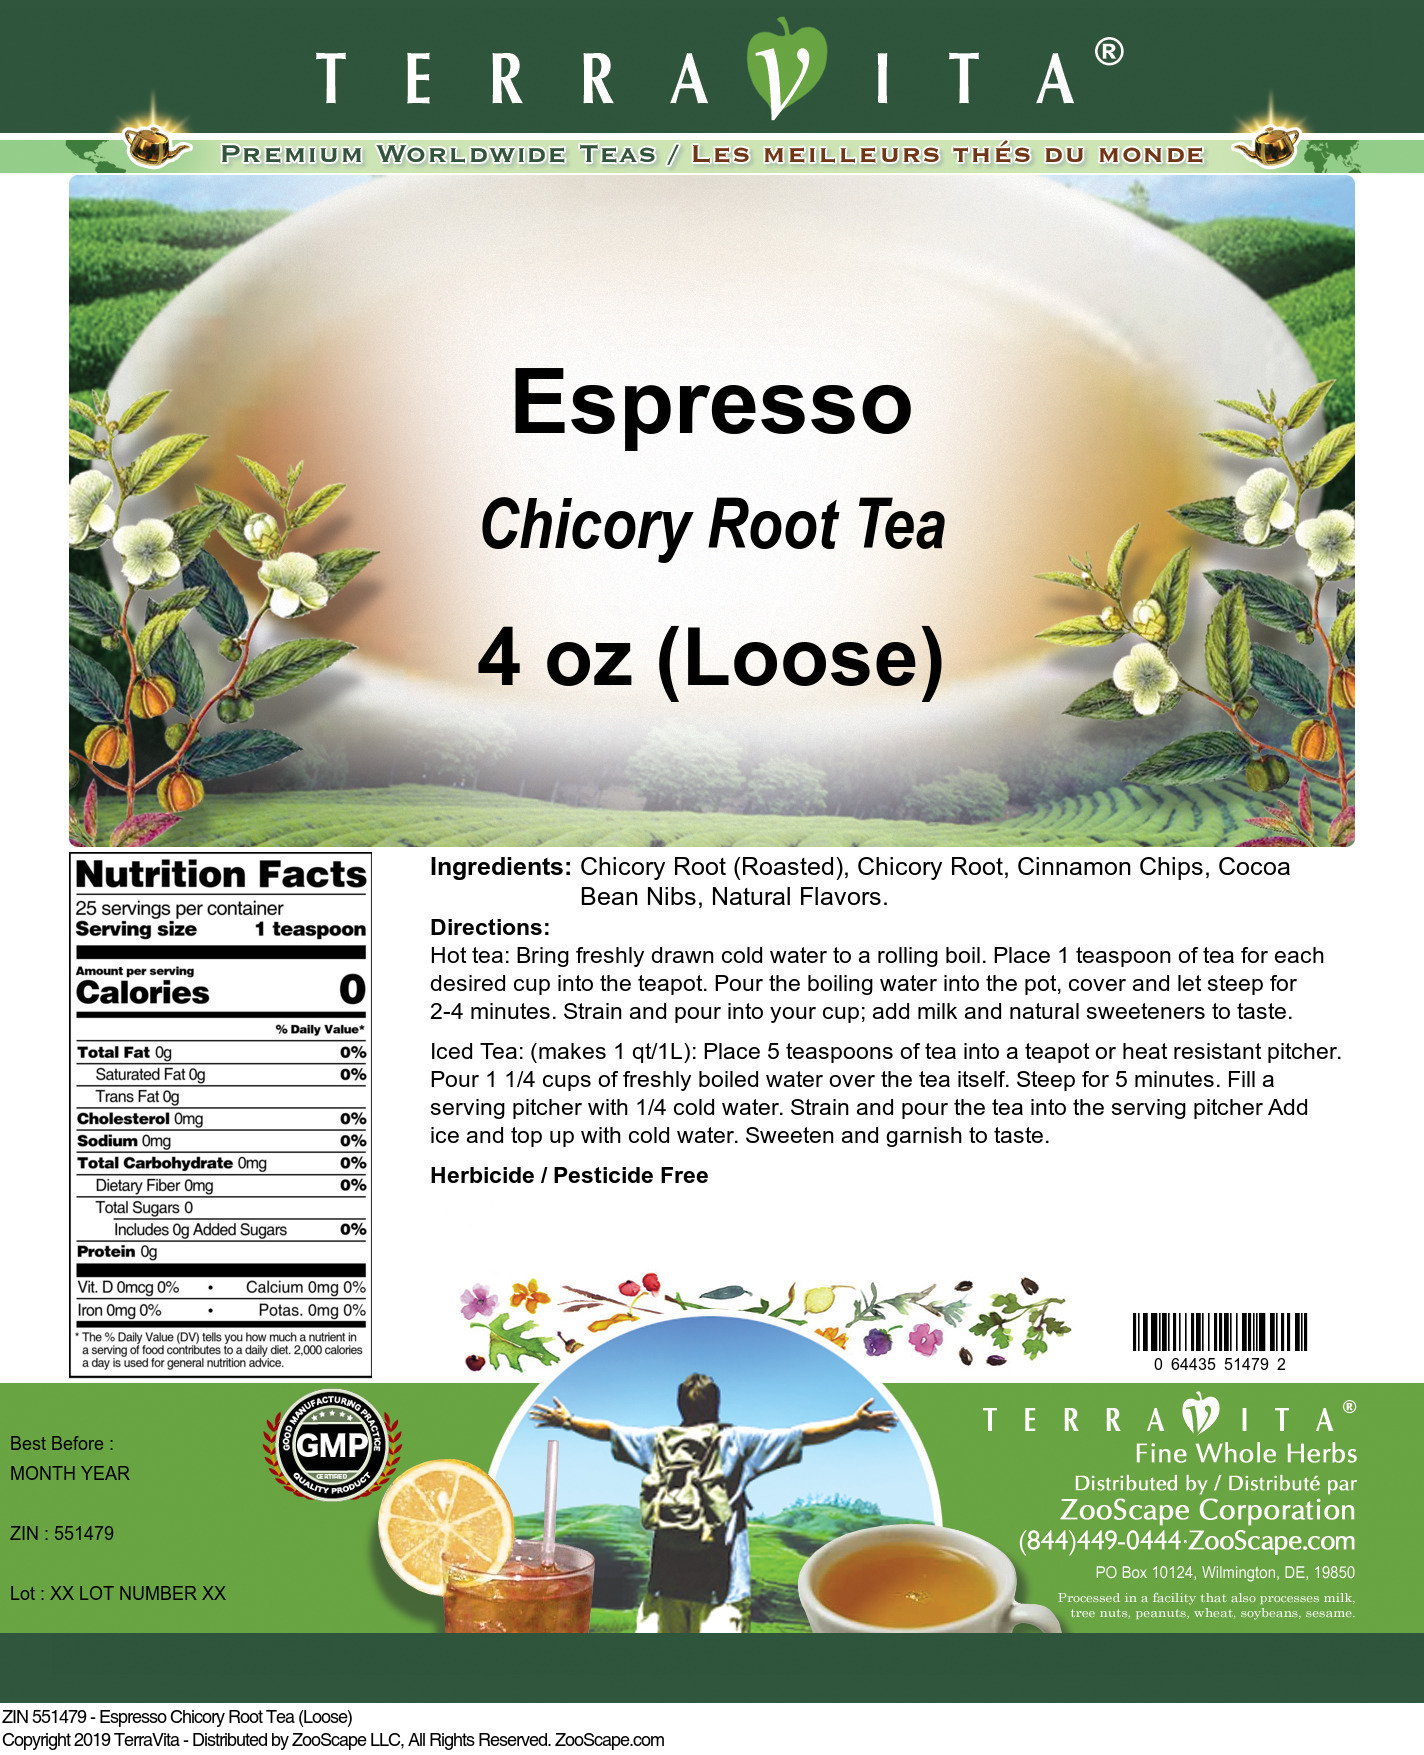 Espresso Chicory Root Tea (Loose)